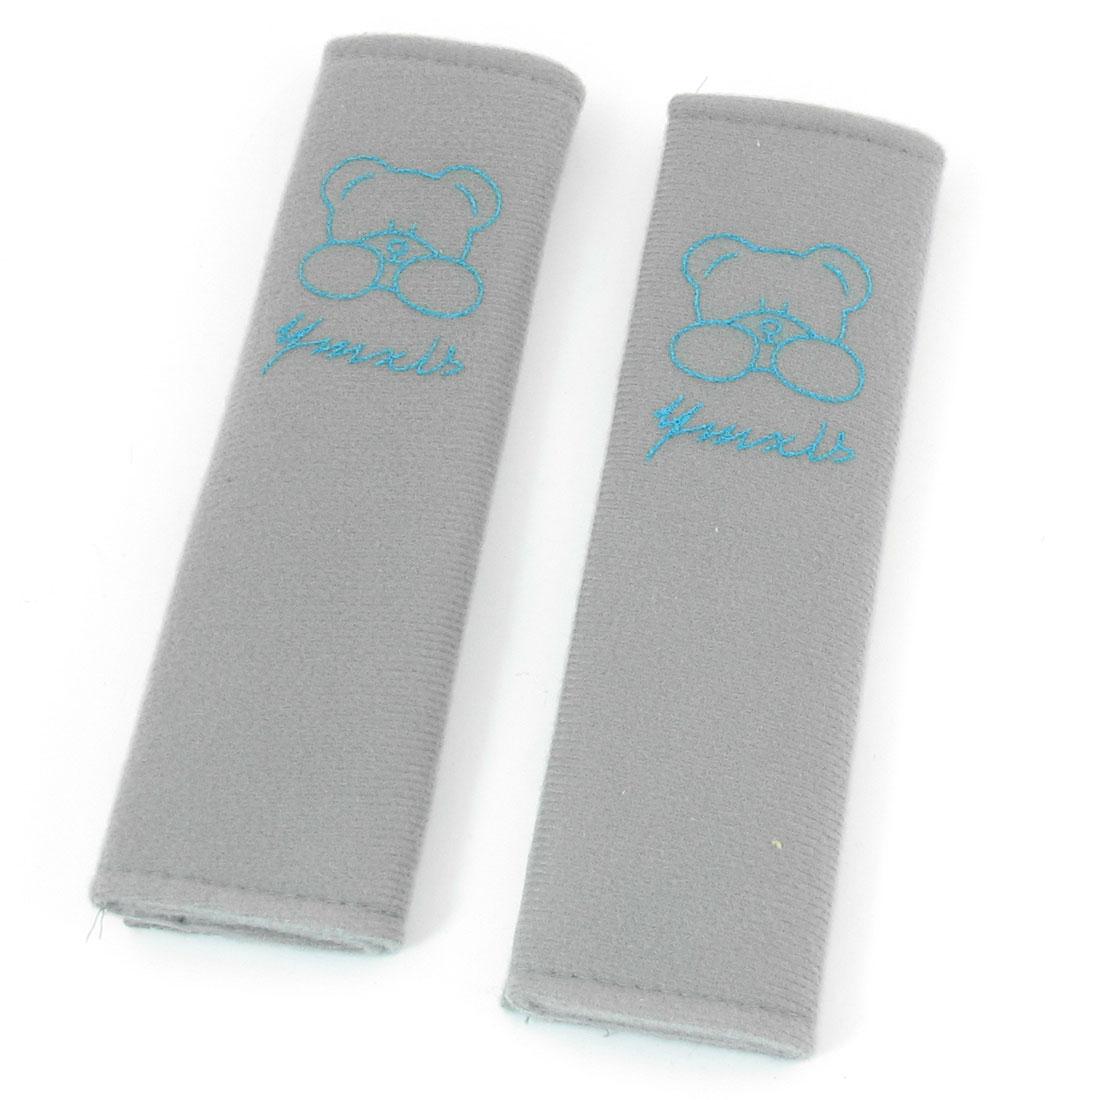 Cars Hook Loop Closure Blue Bear Print Gray Seat Belt Shoulder Fleece Pads x 2